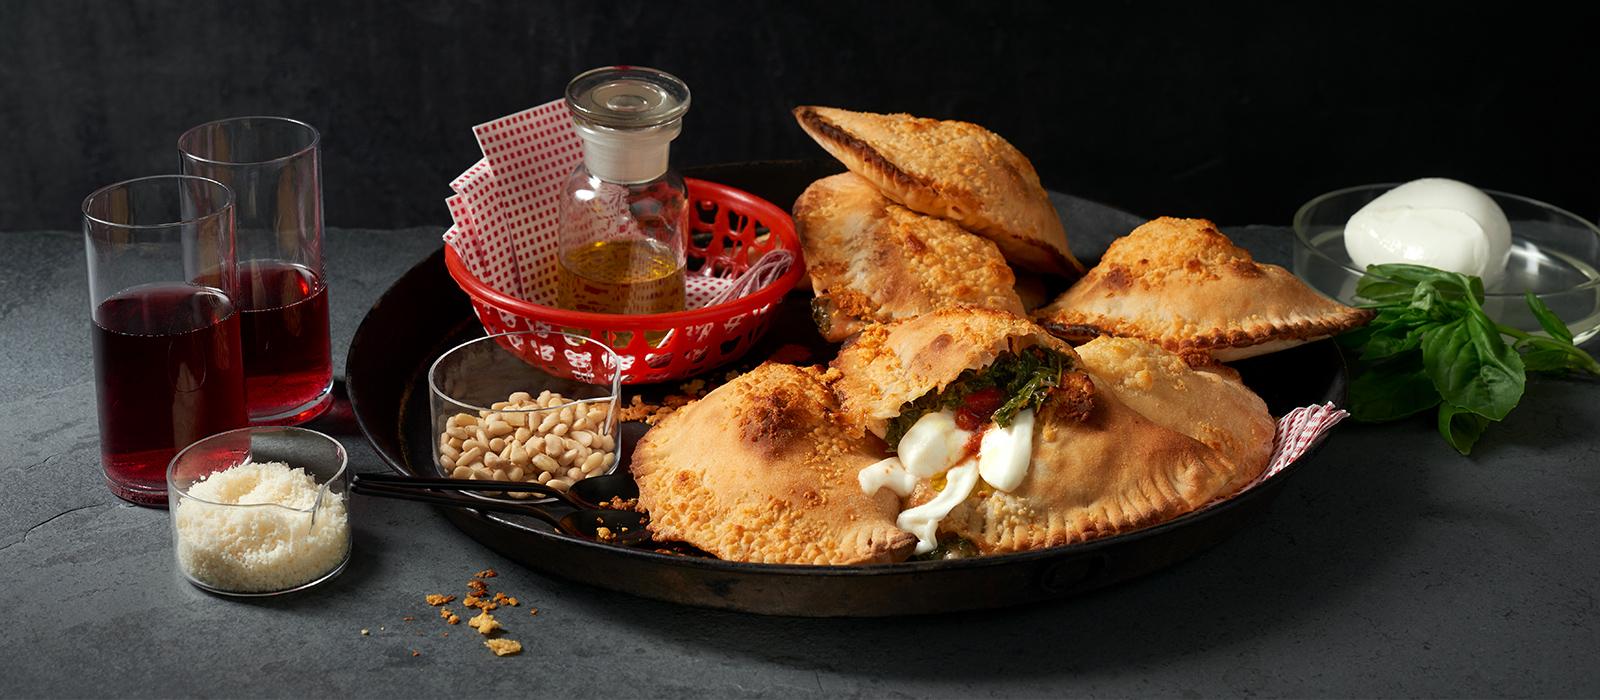 Mini-Calzone mit Mozzarella